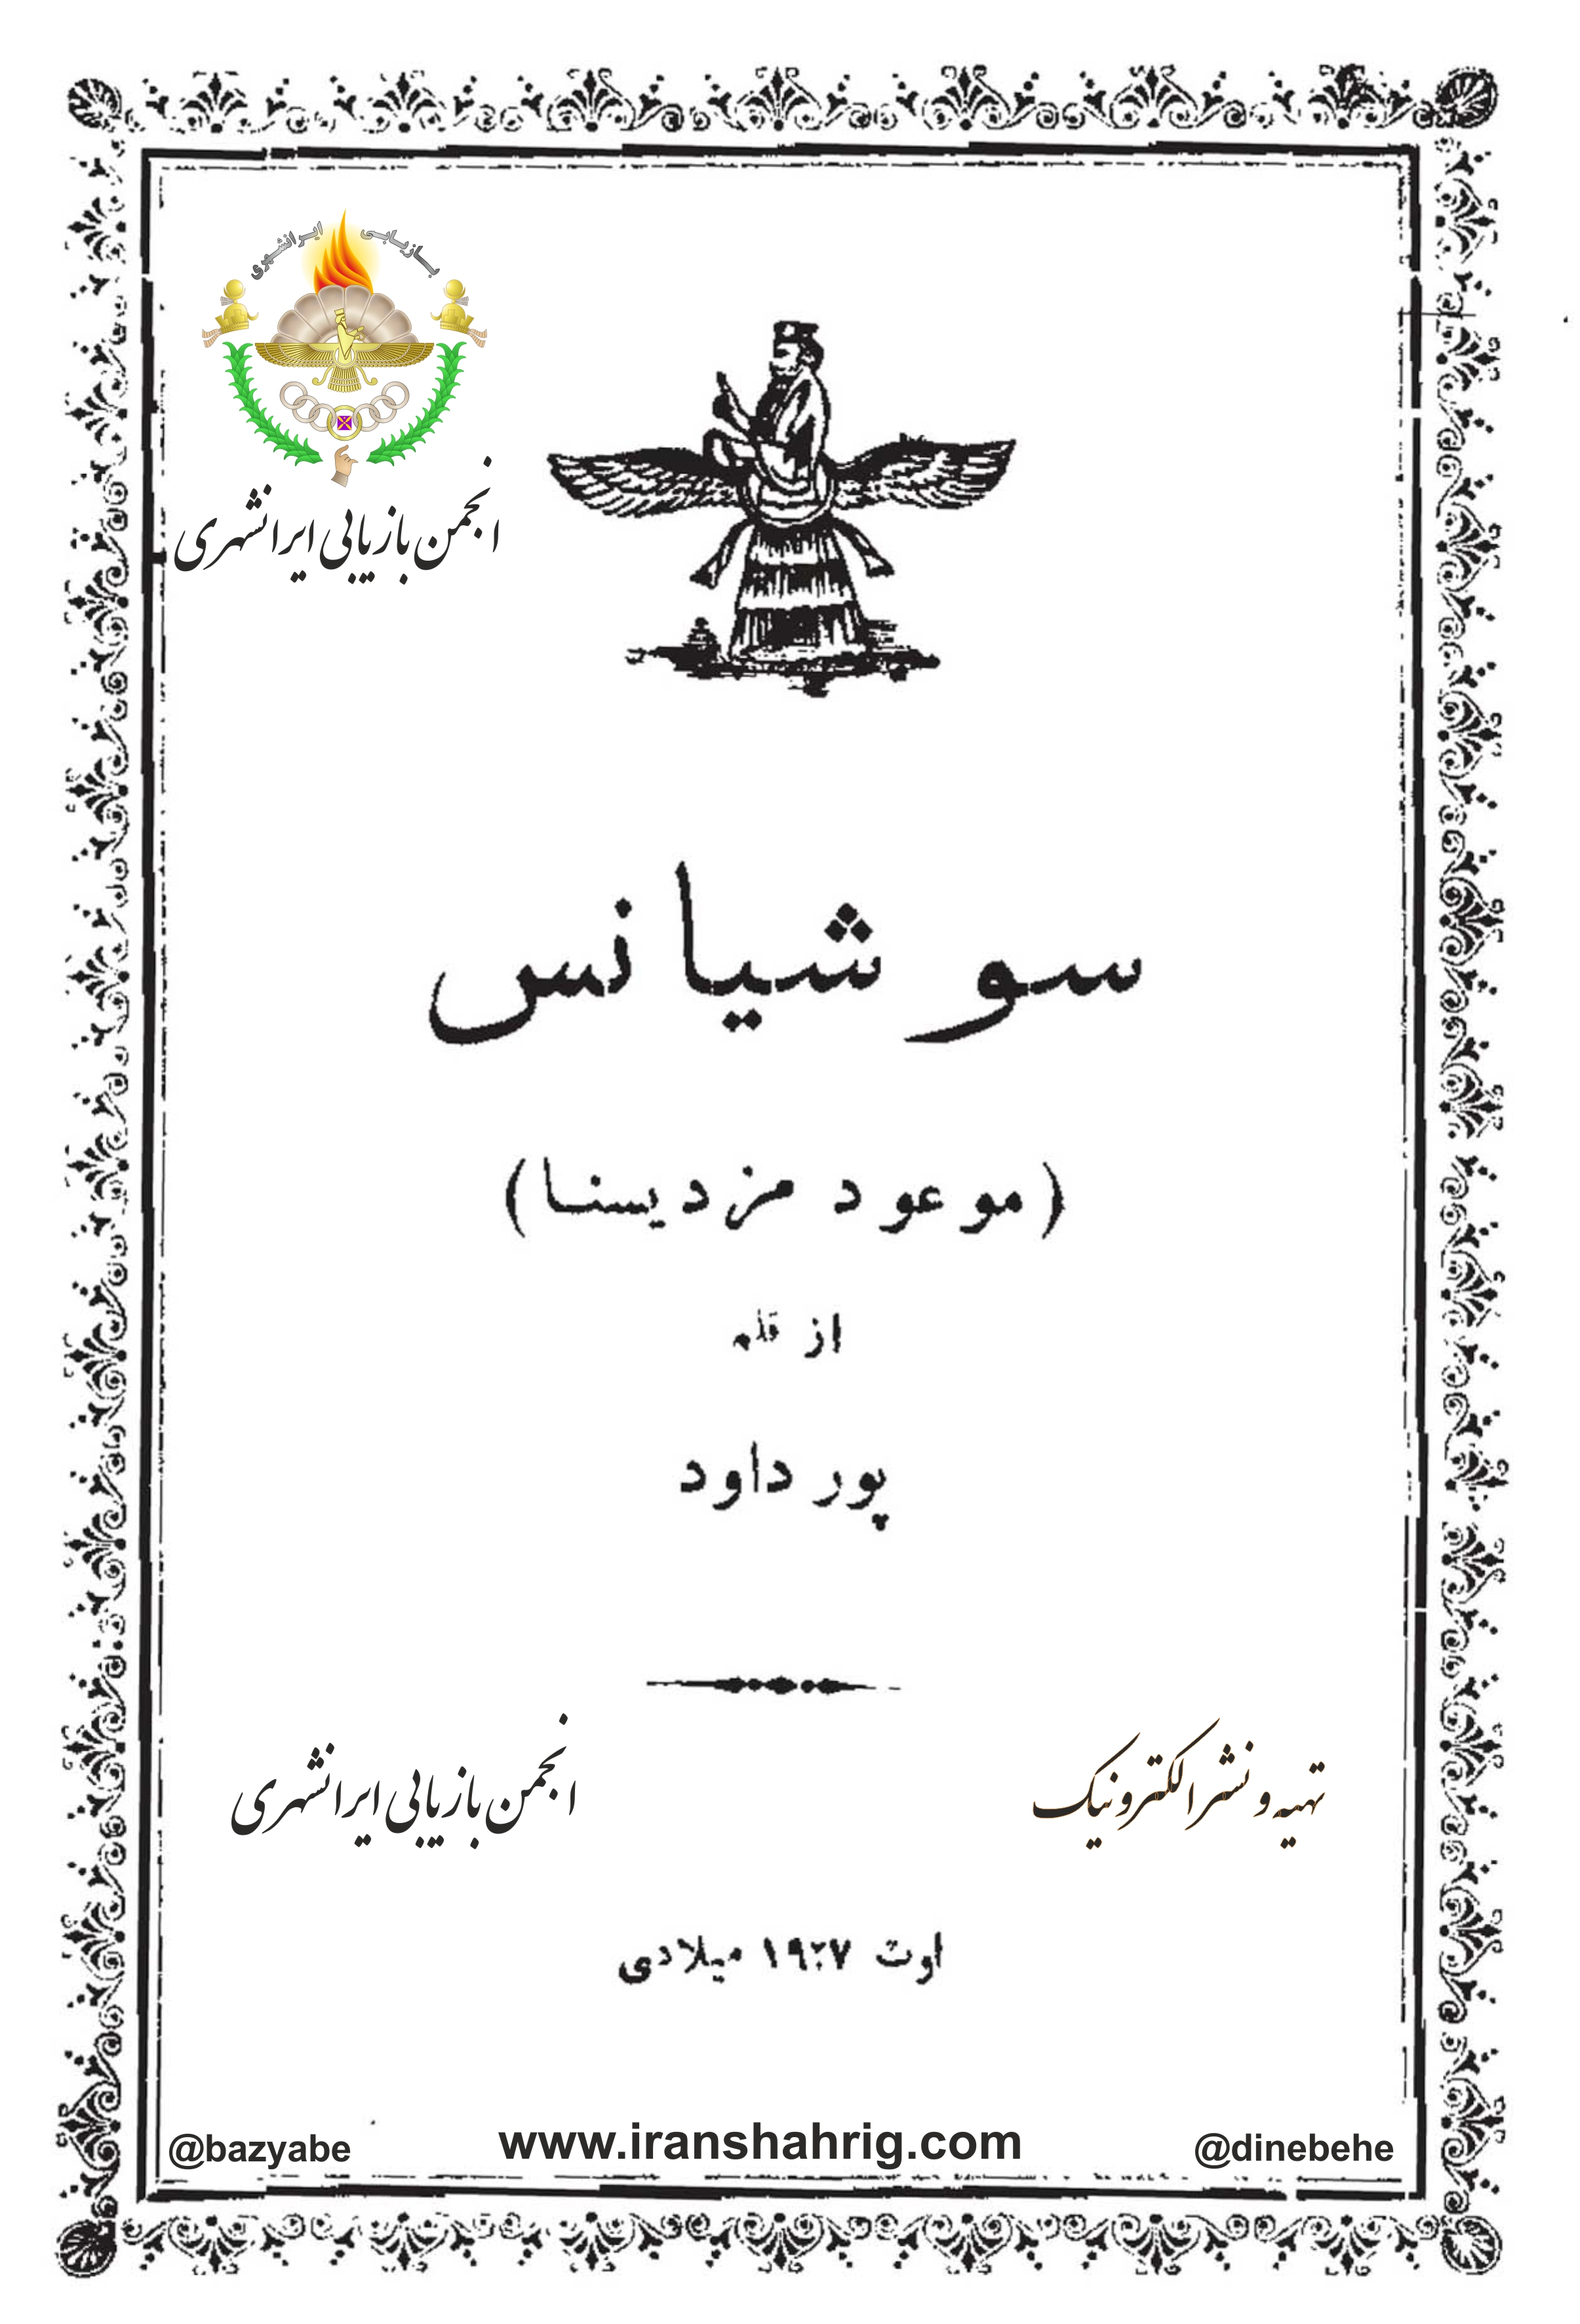 سوشیانس / ابراهیم پورداوود